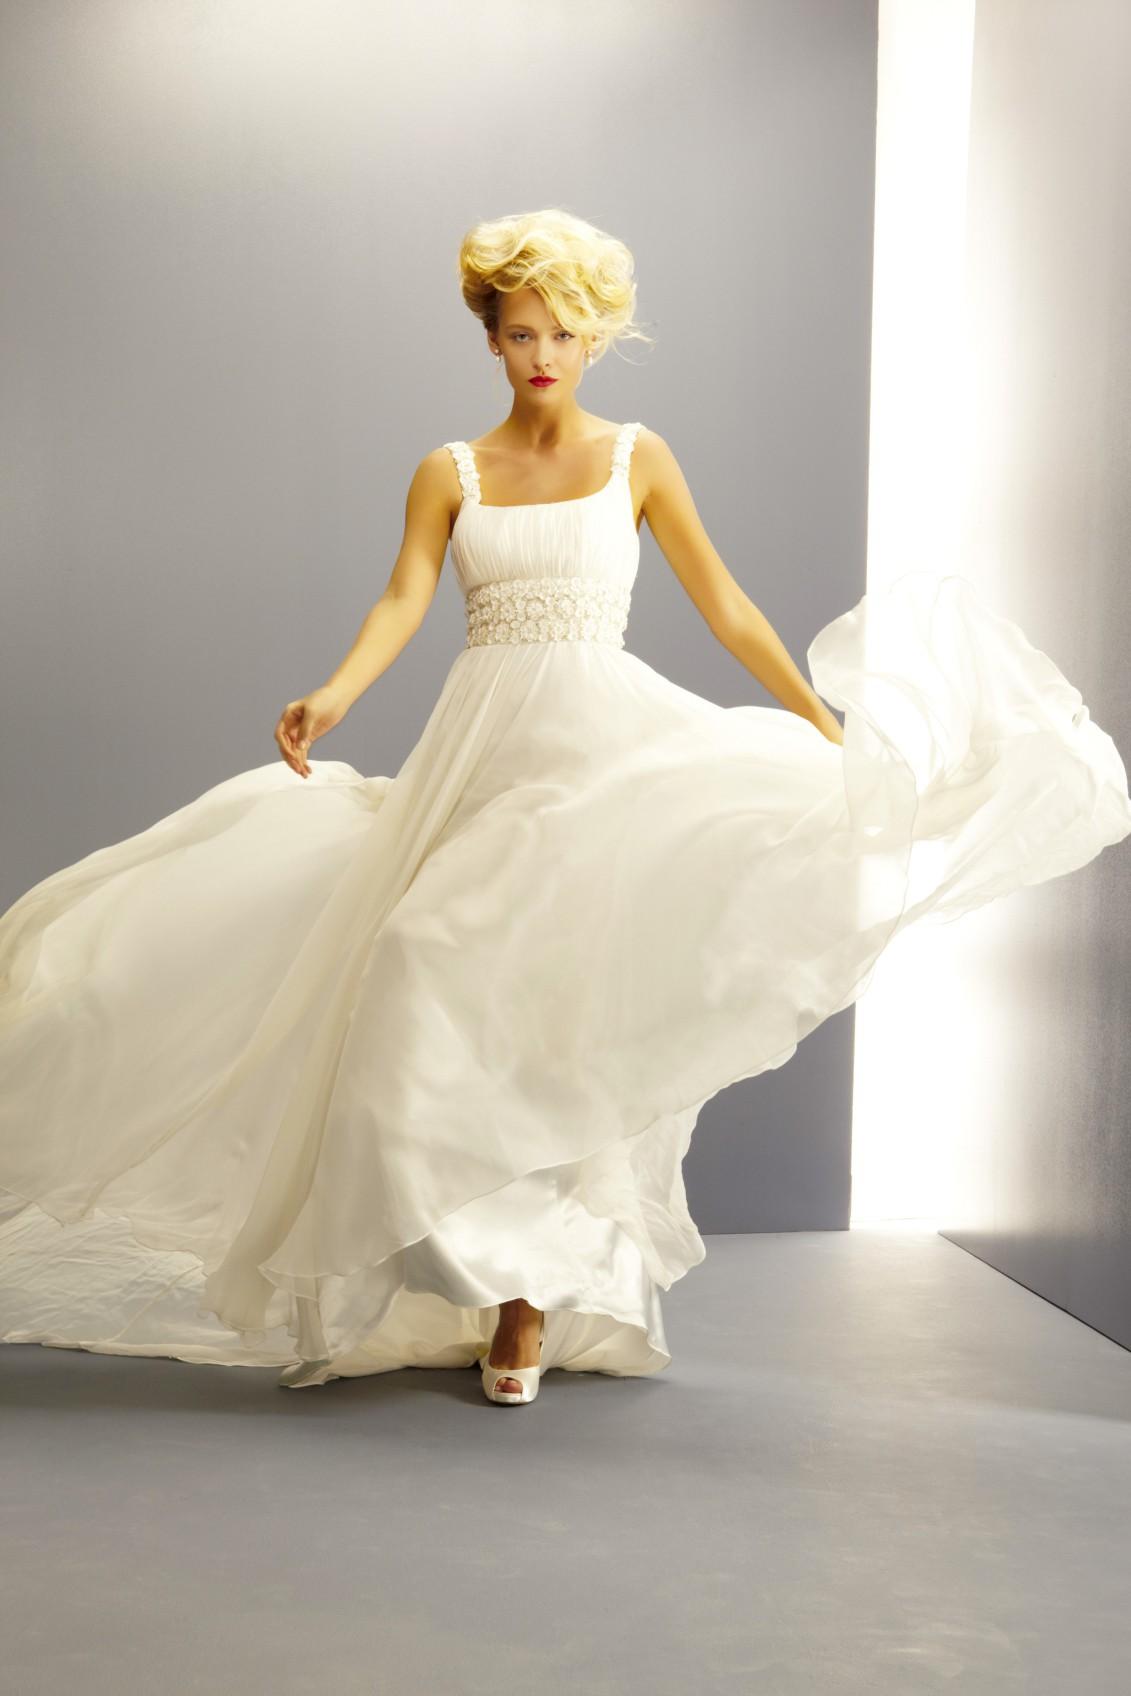 Ritva Westenius Delightful Wedding Dress On Sale 80 Off